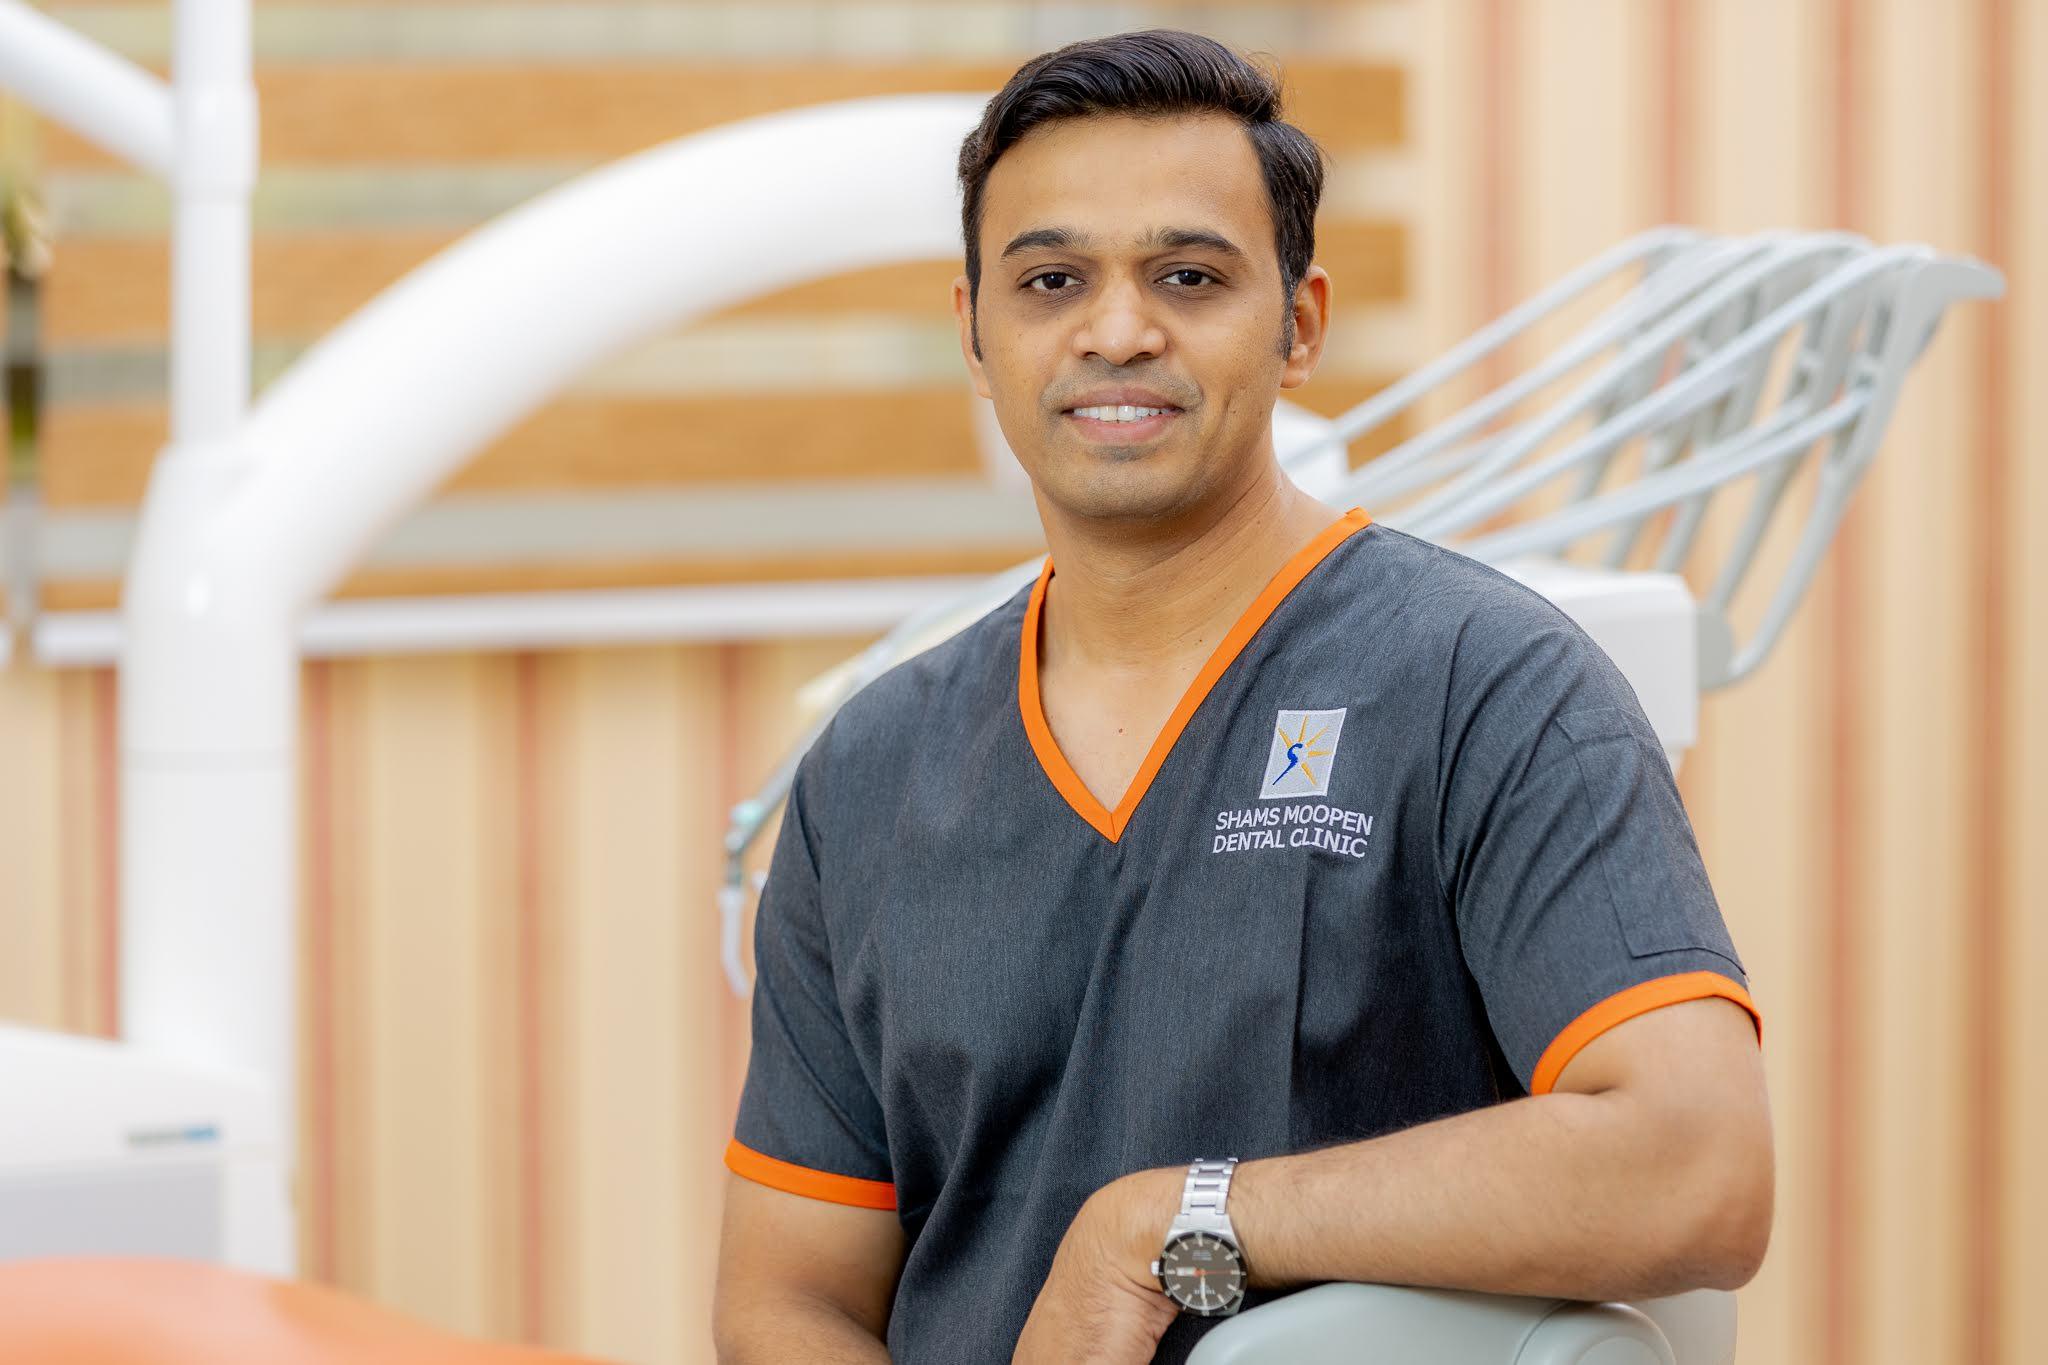 Dr Noushad Moopan